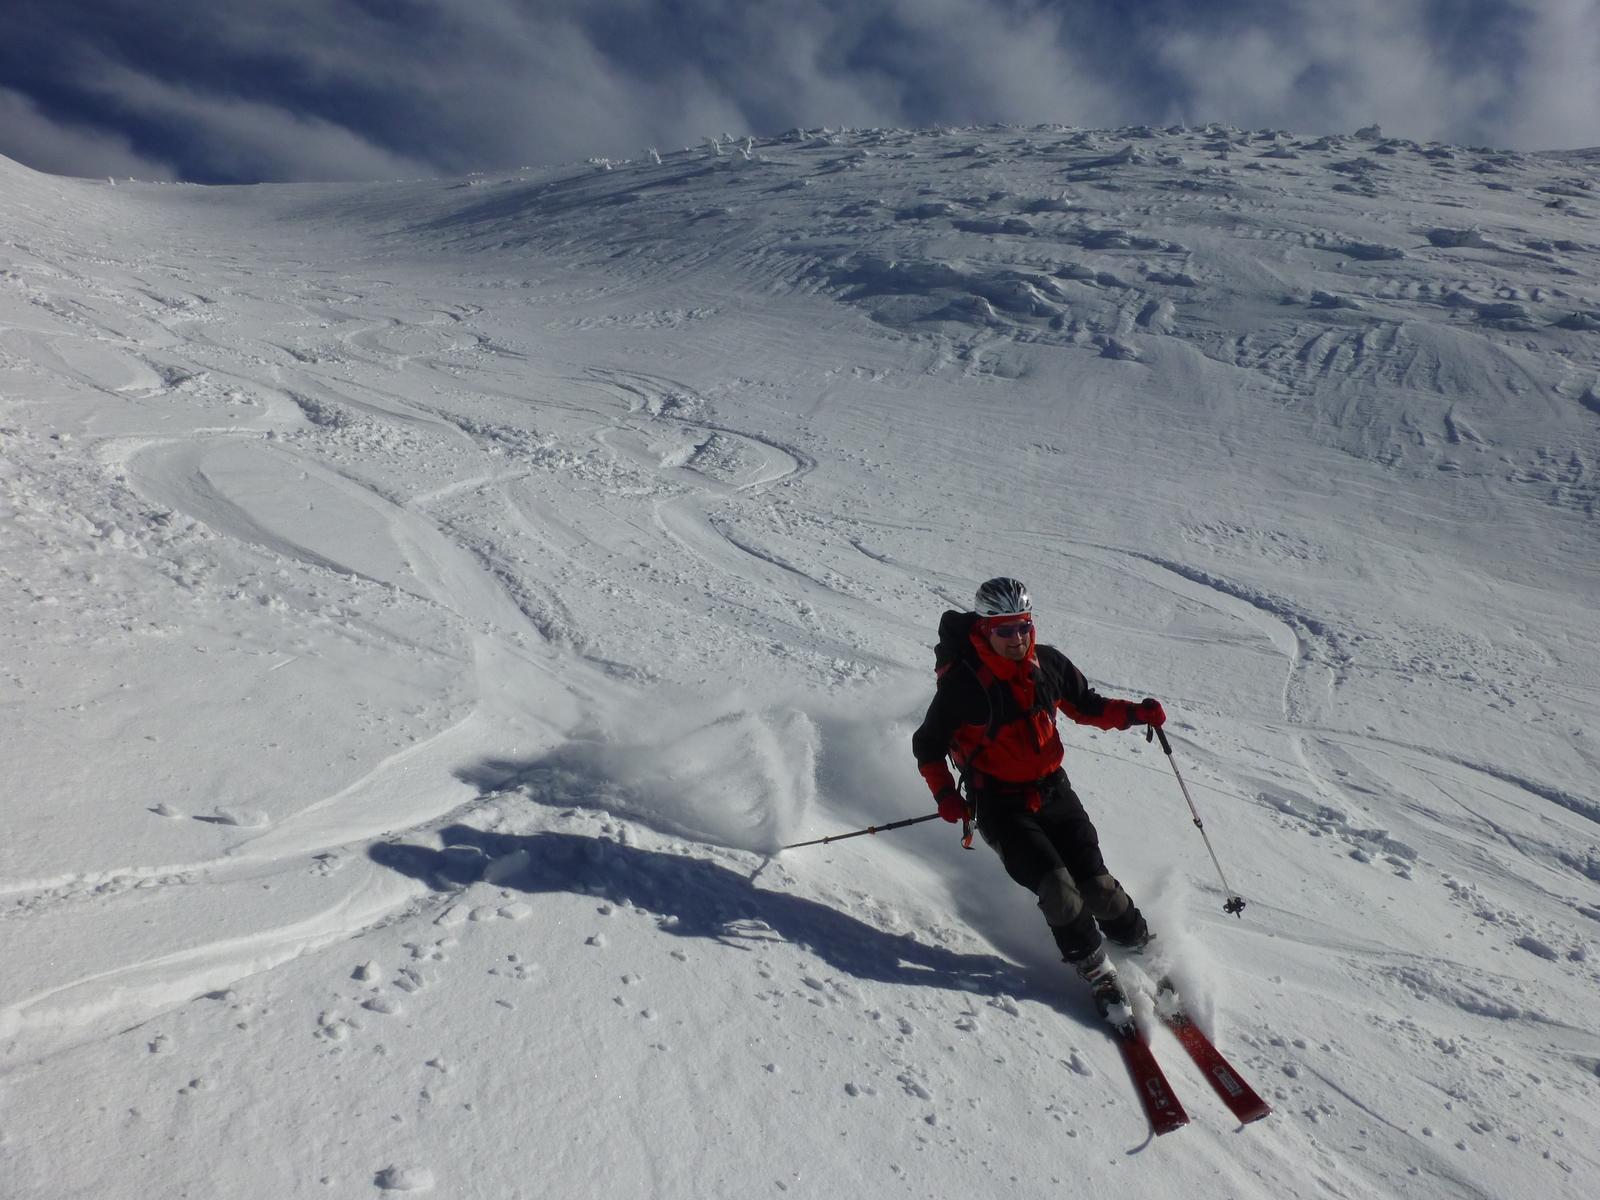 Schneeberg Skitourenlauf 2019